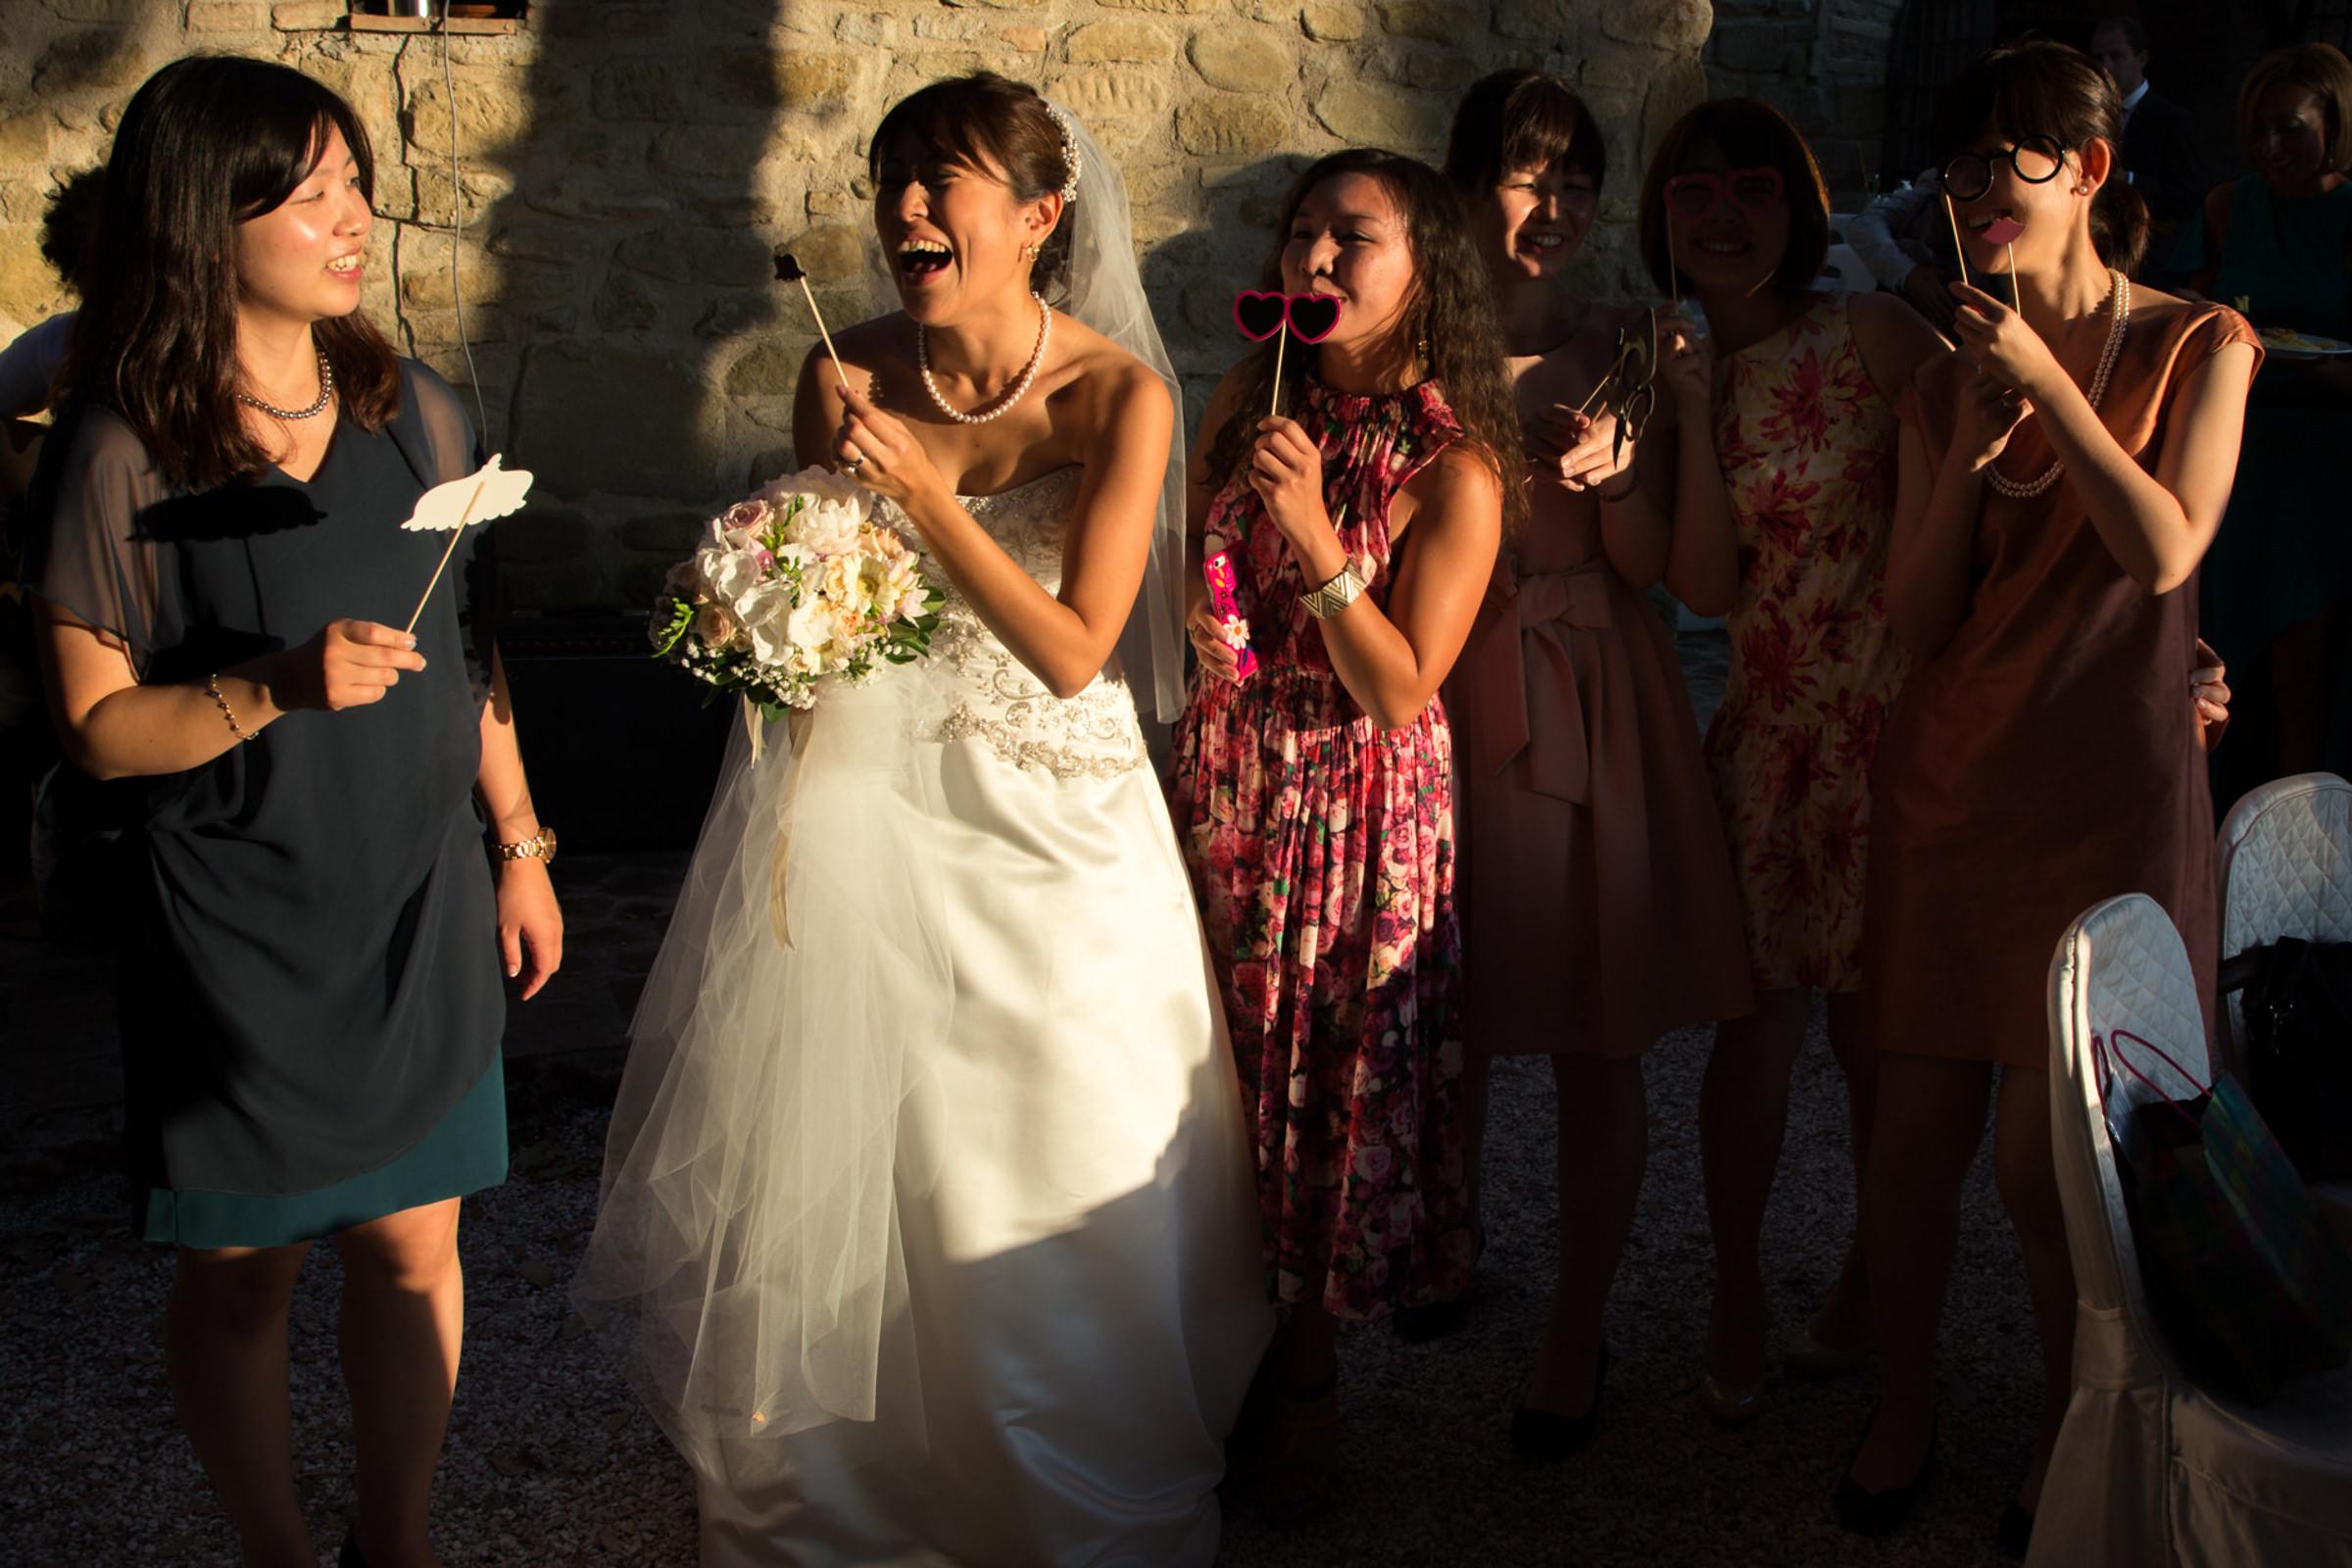 wedding bride having fun.jpg